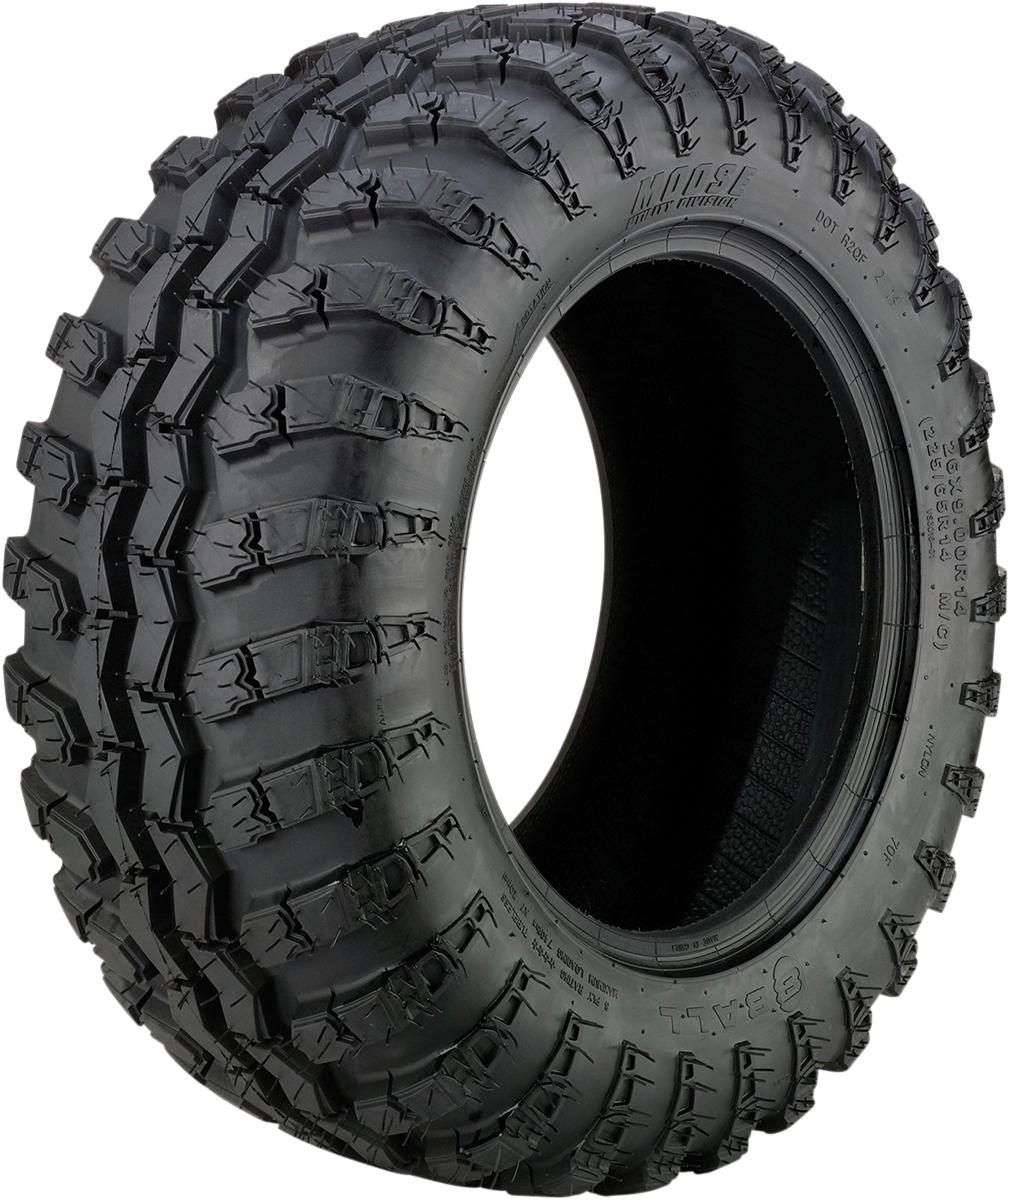 8-Ball Tires